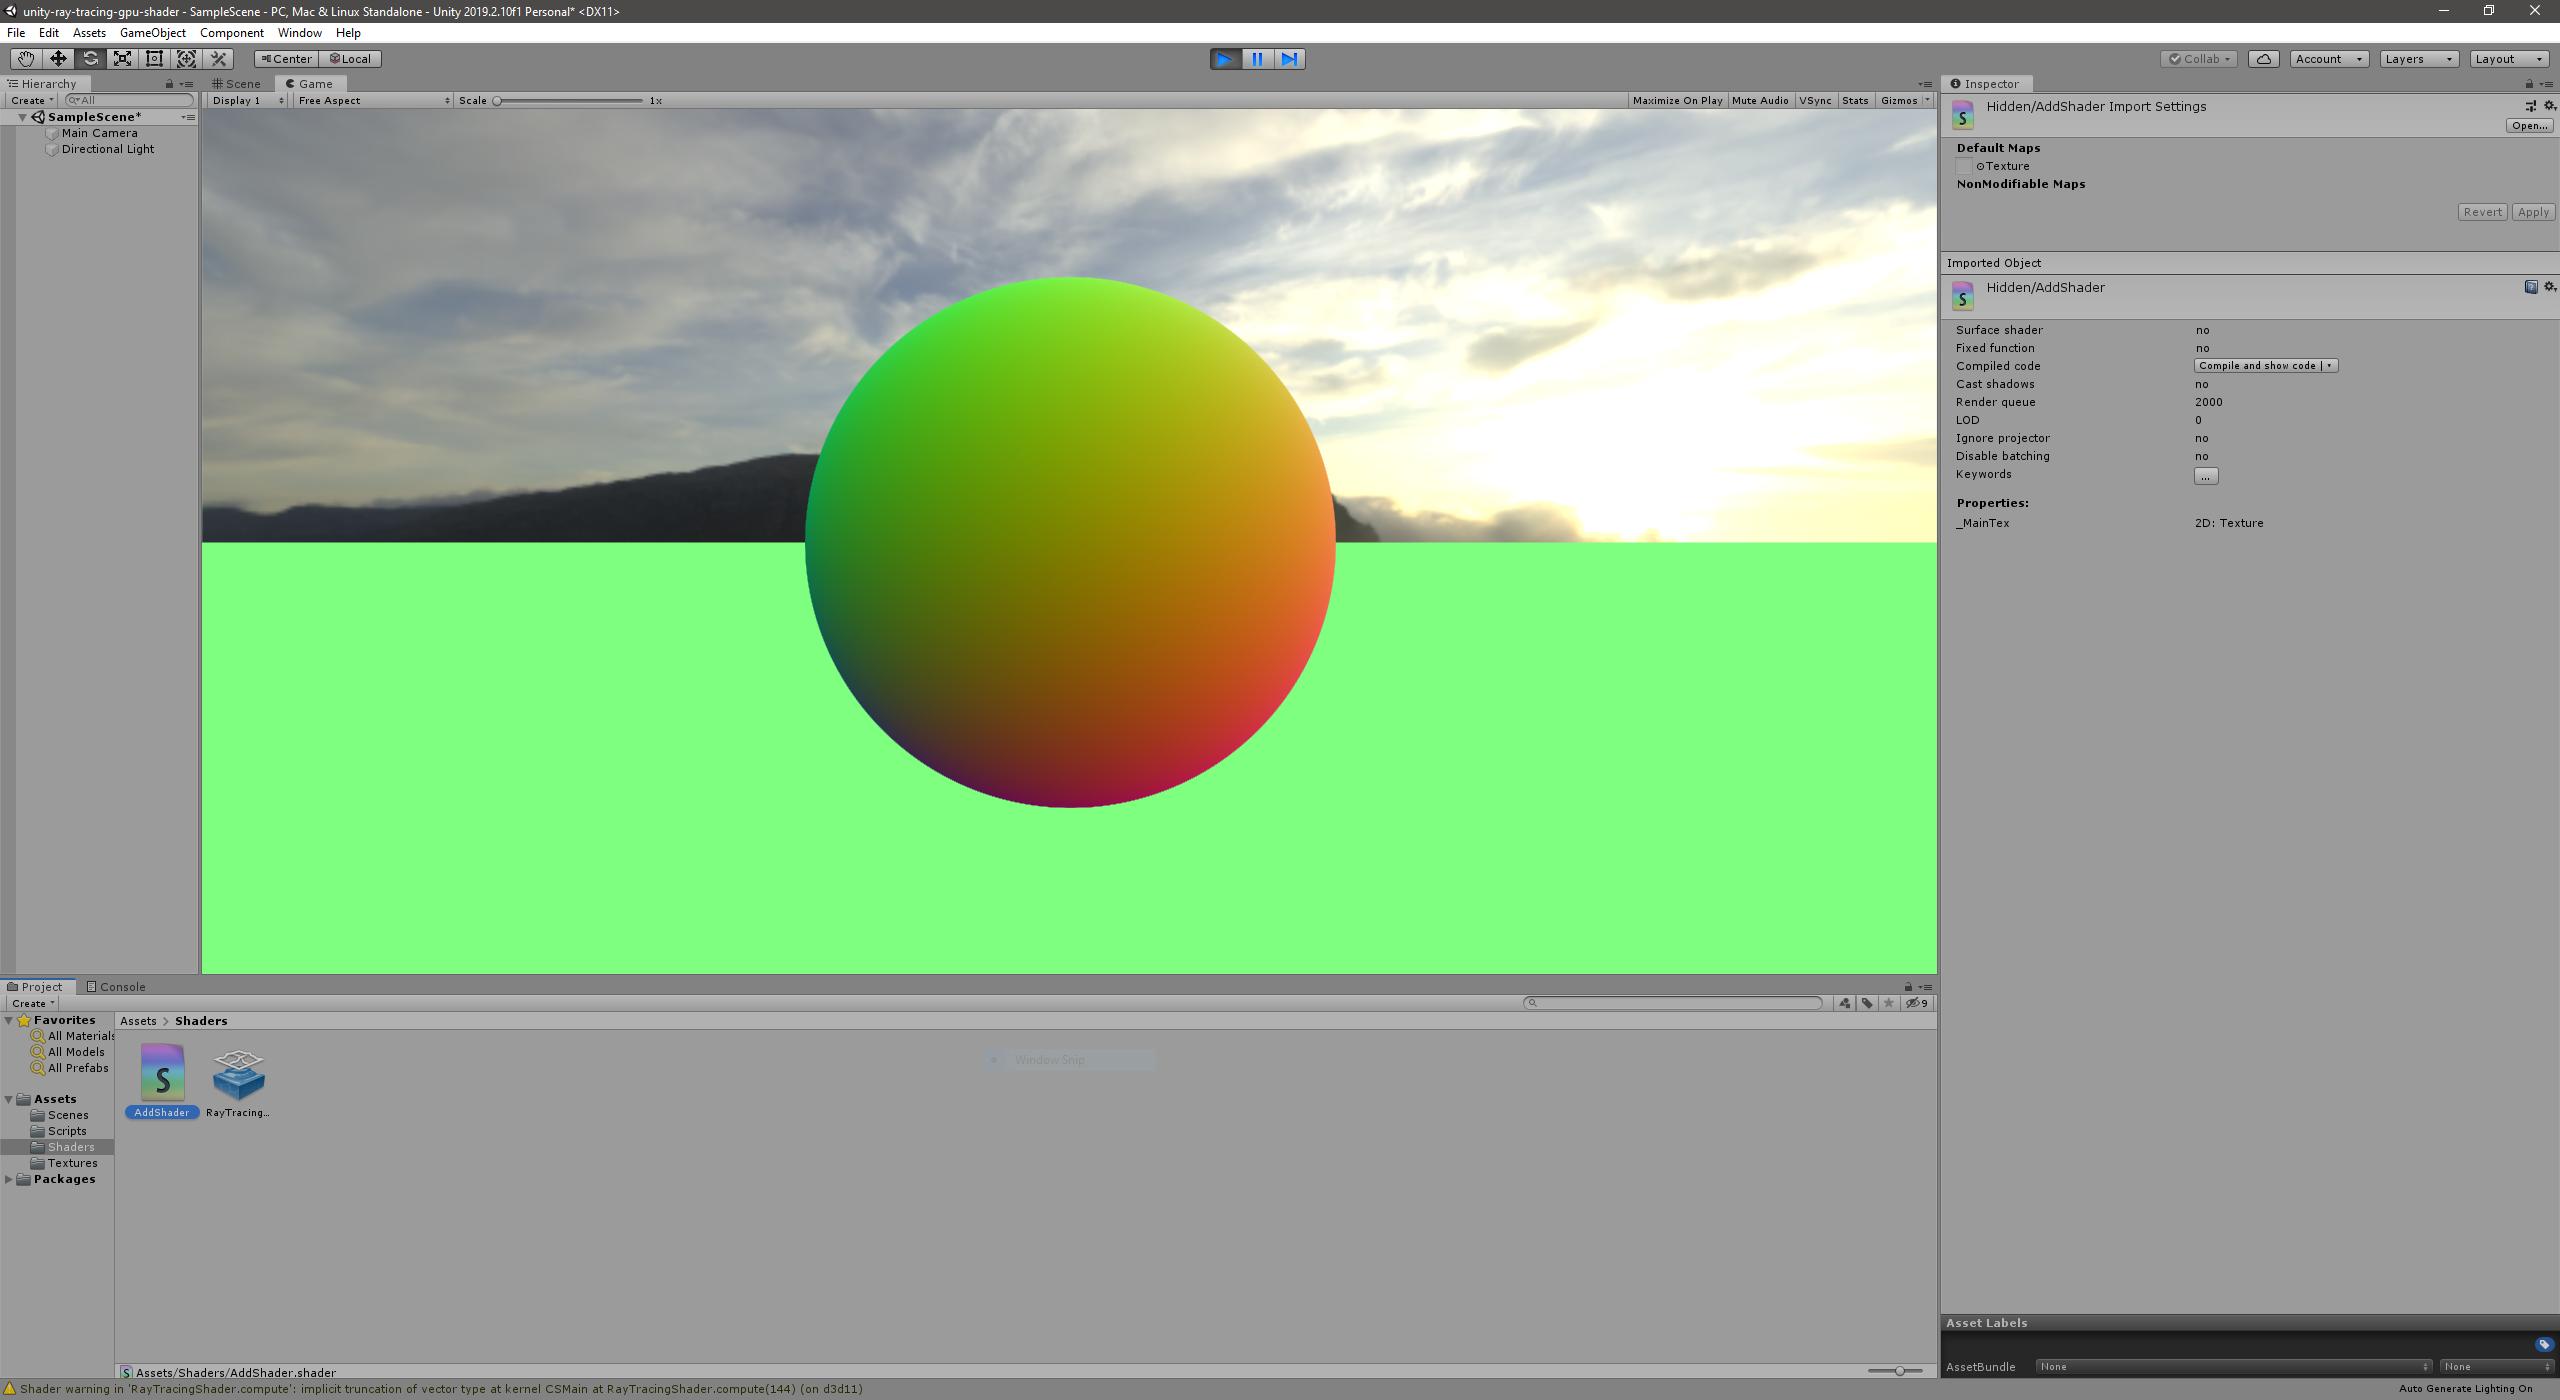 Sphere with Progressive Sampling